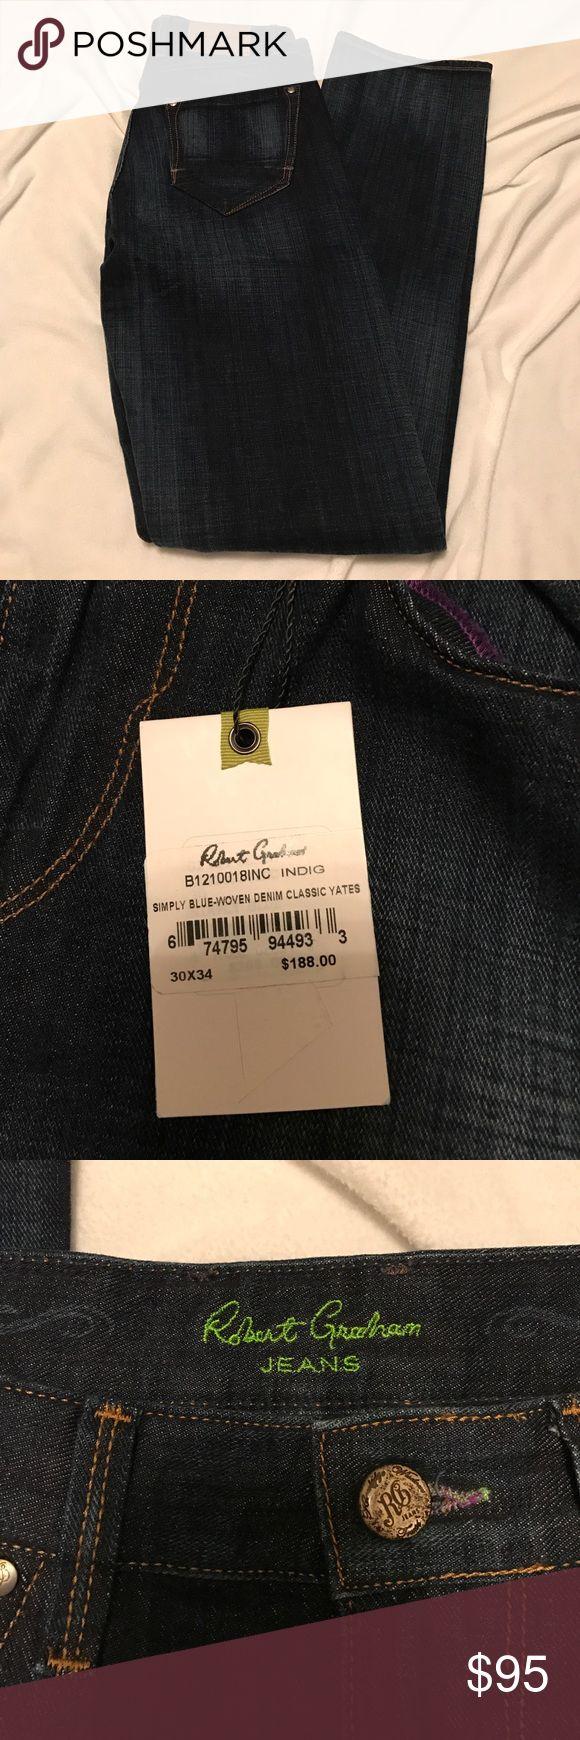 Robert Graham Classic Yates NWT Size 30 x 34 Robert Graham Classic Yates NWT Size 30 x 34 Robert Graham Jeans